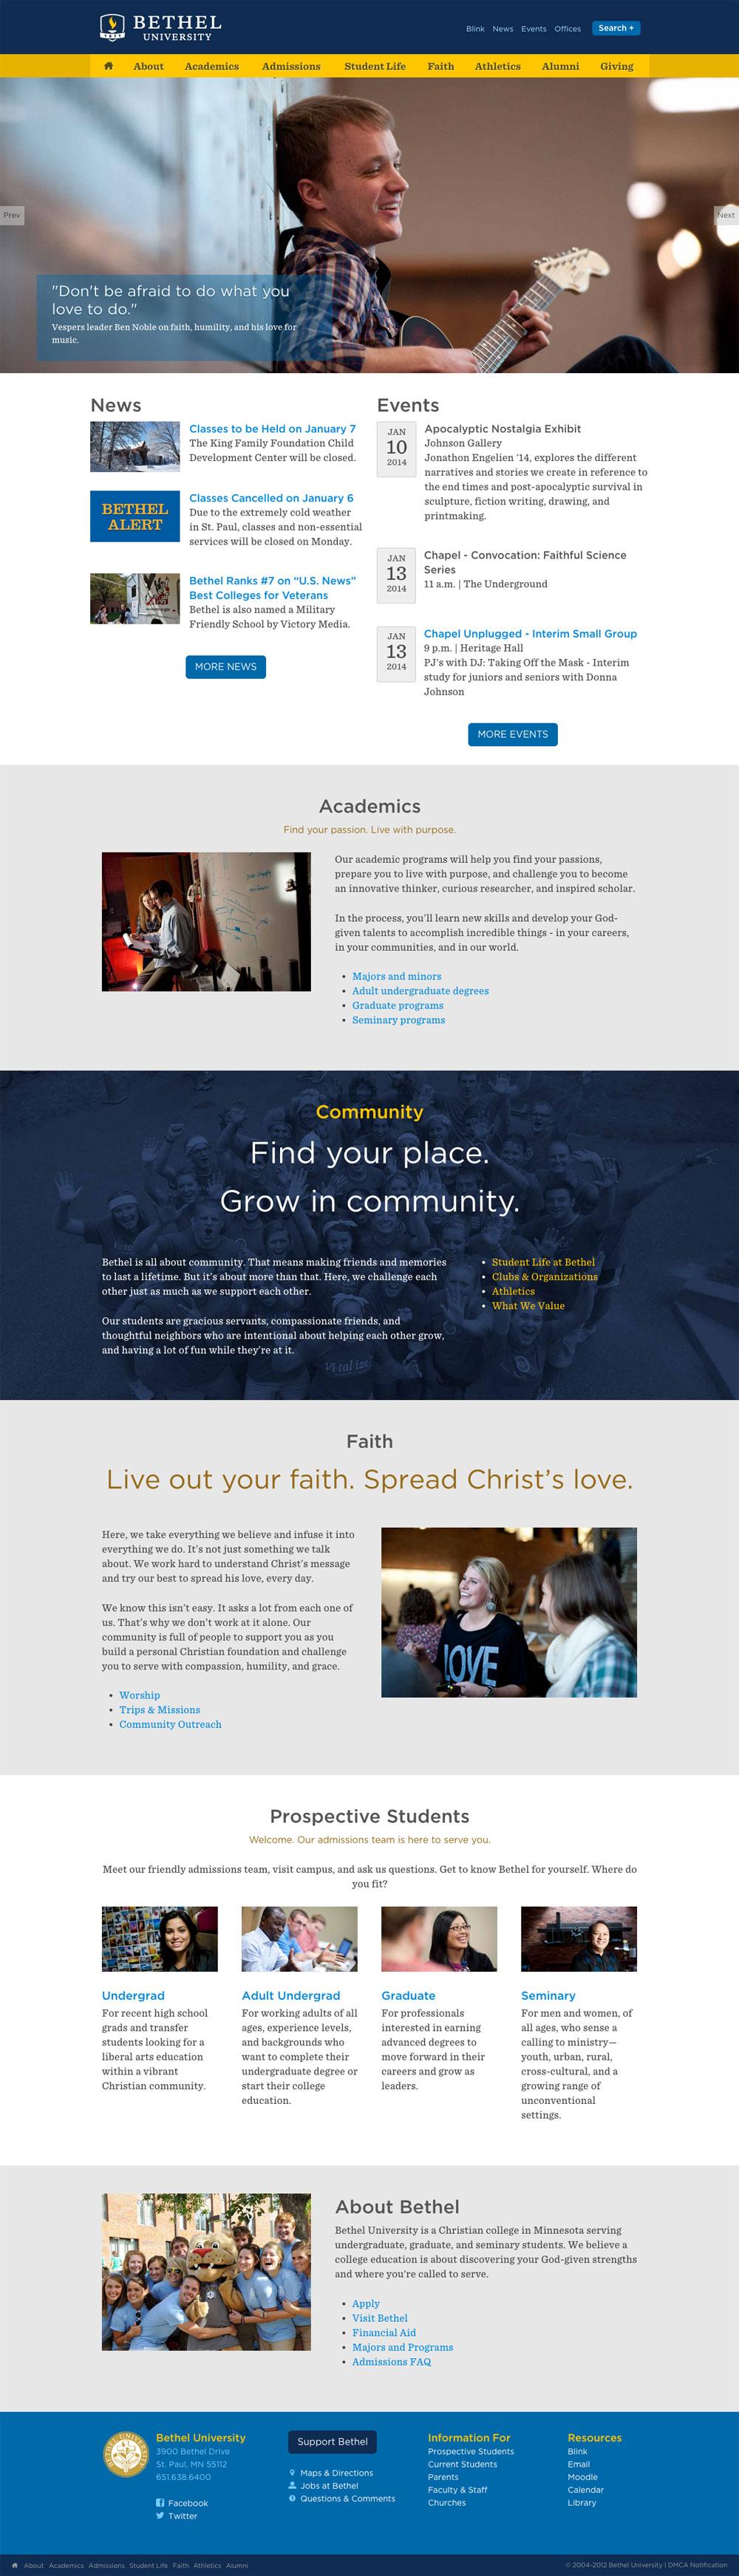 Bethel University homepage